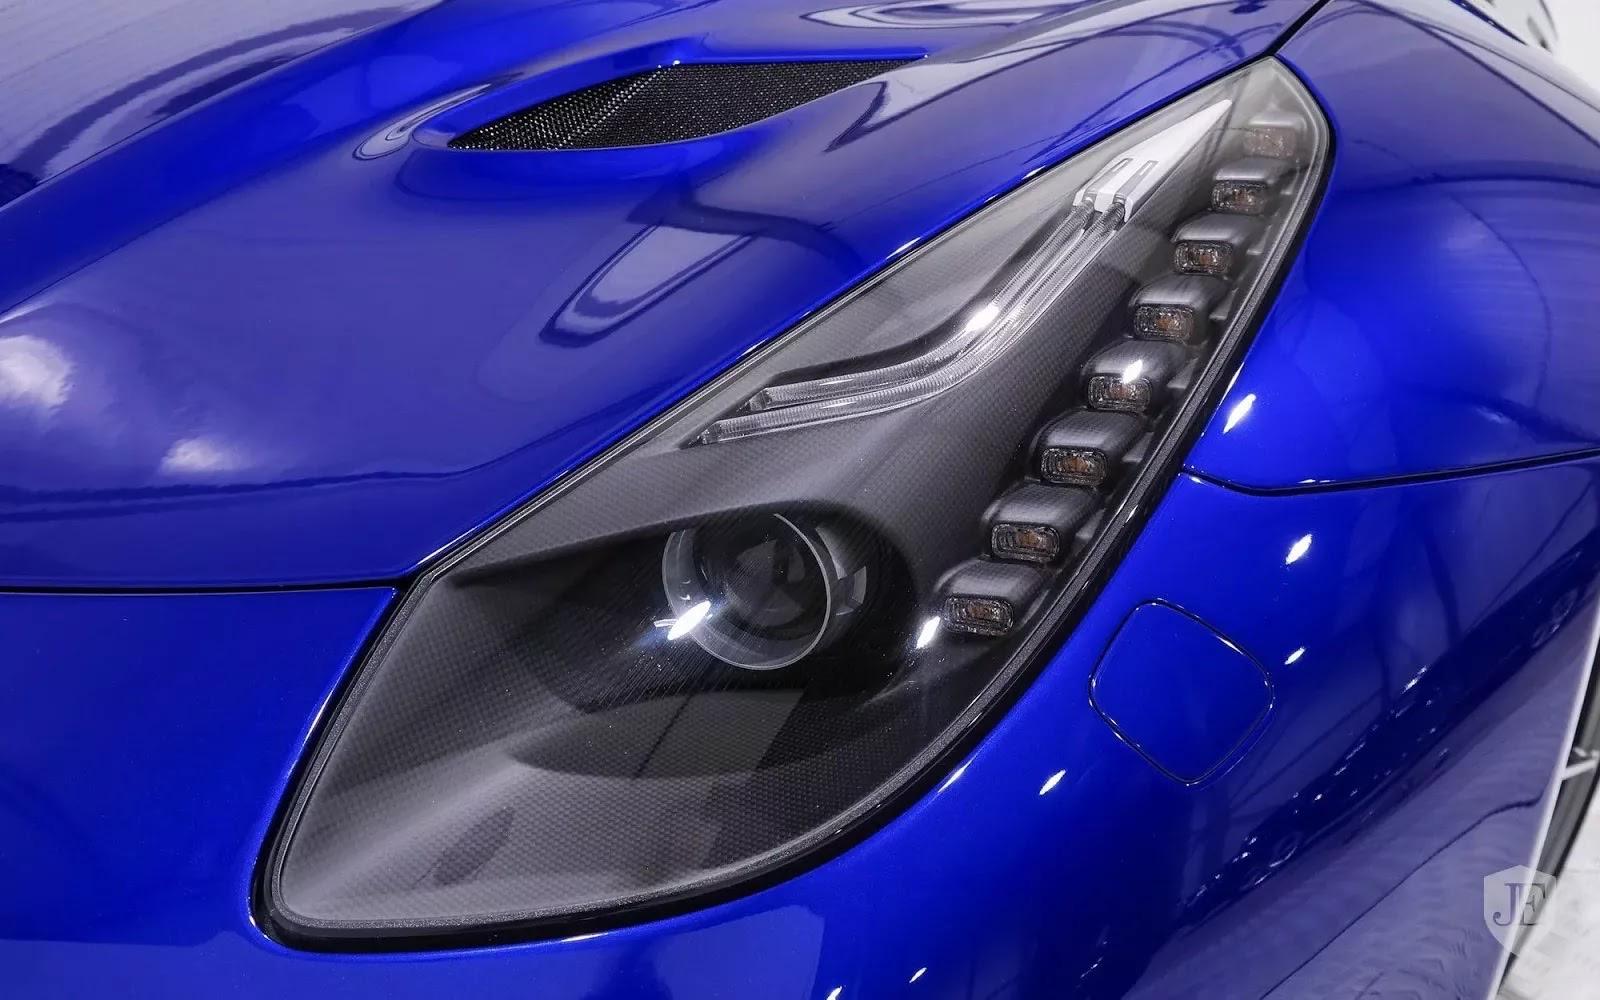 One-Off_Electric_Blue_Ferrari_F12tdf_15